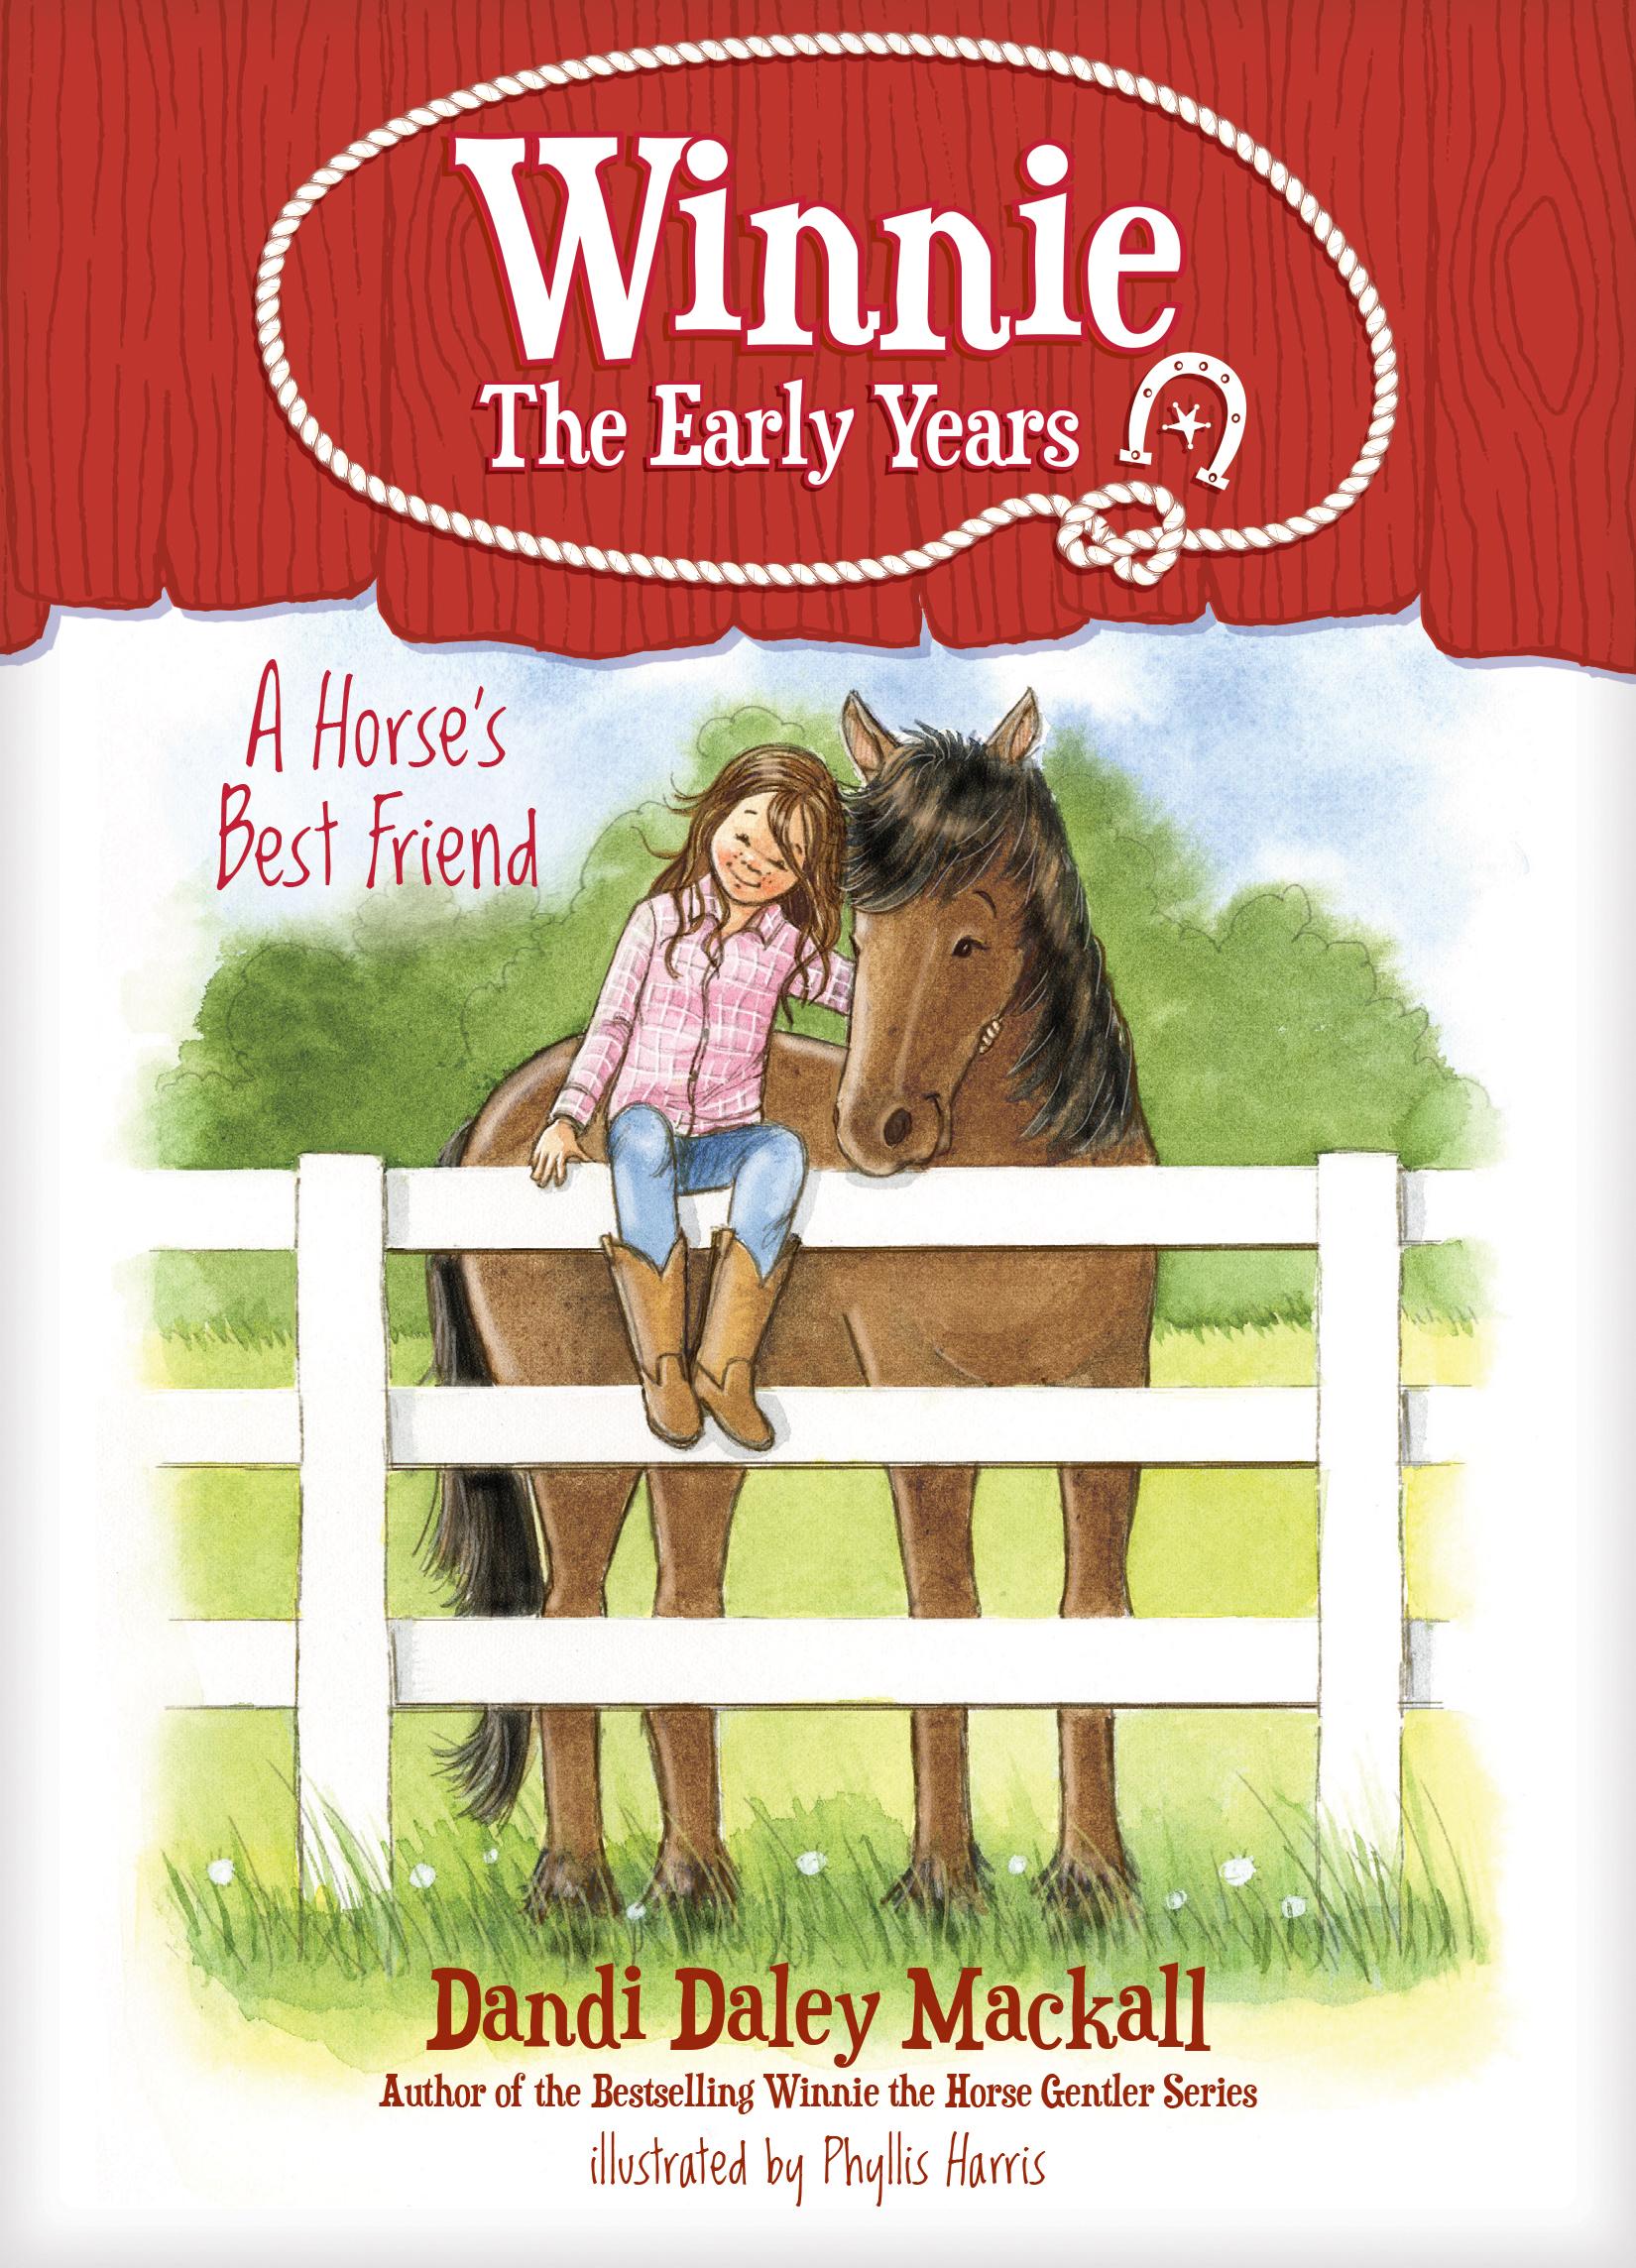 A Horse's Best Friend